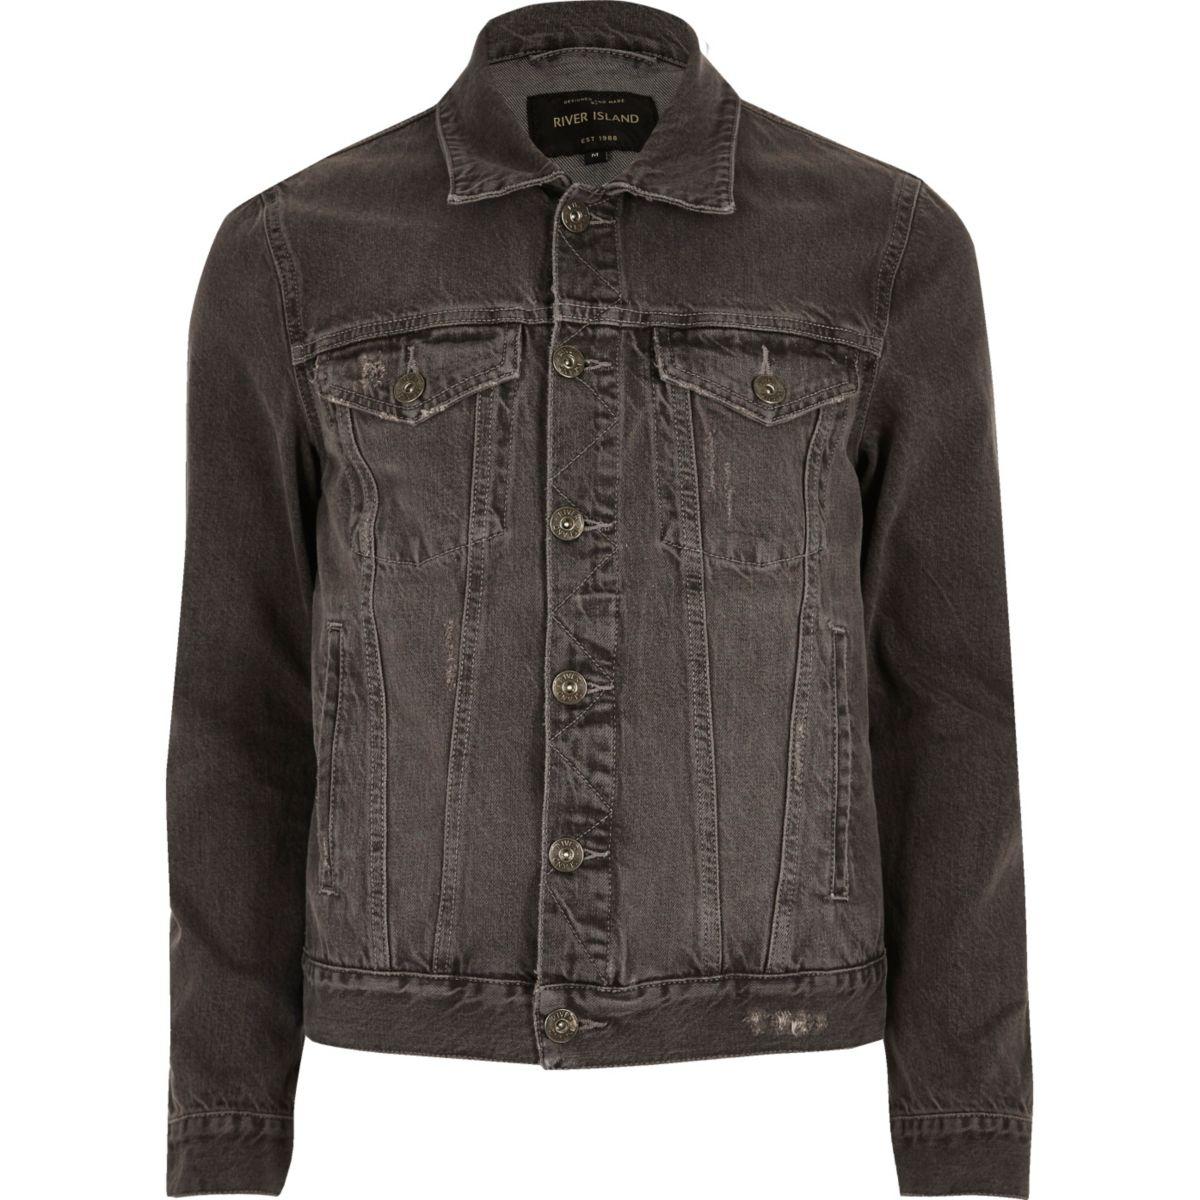 Grey acid wash denim jacket